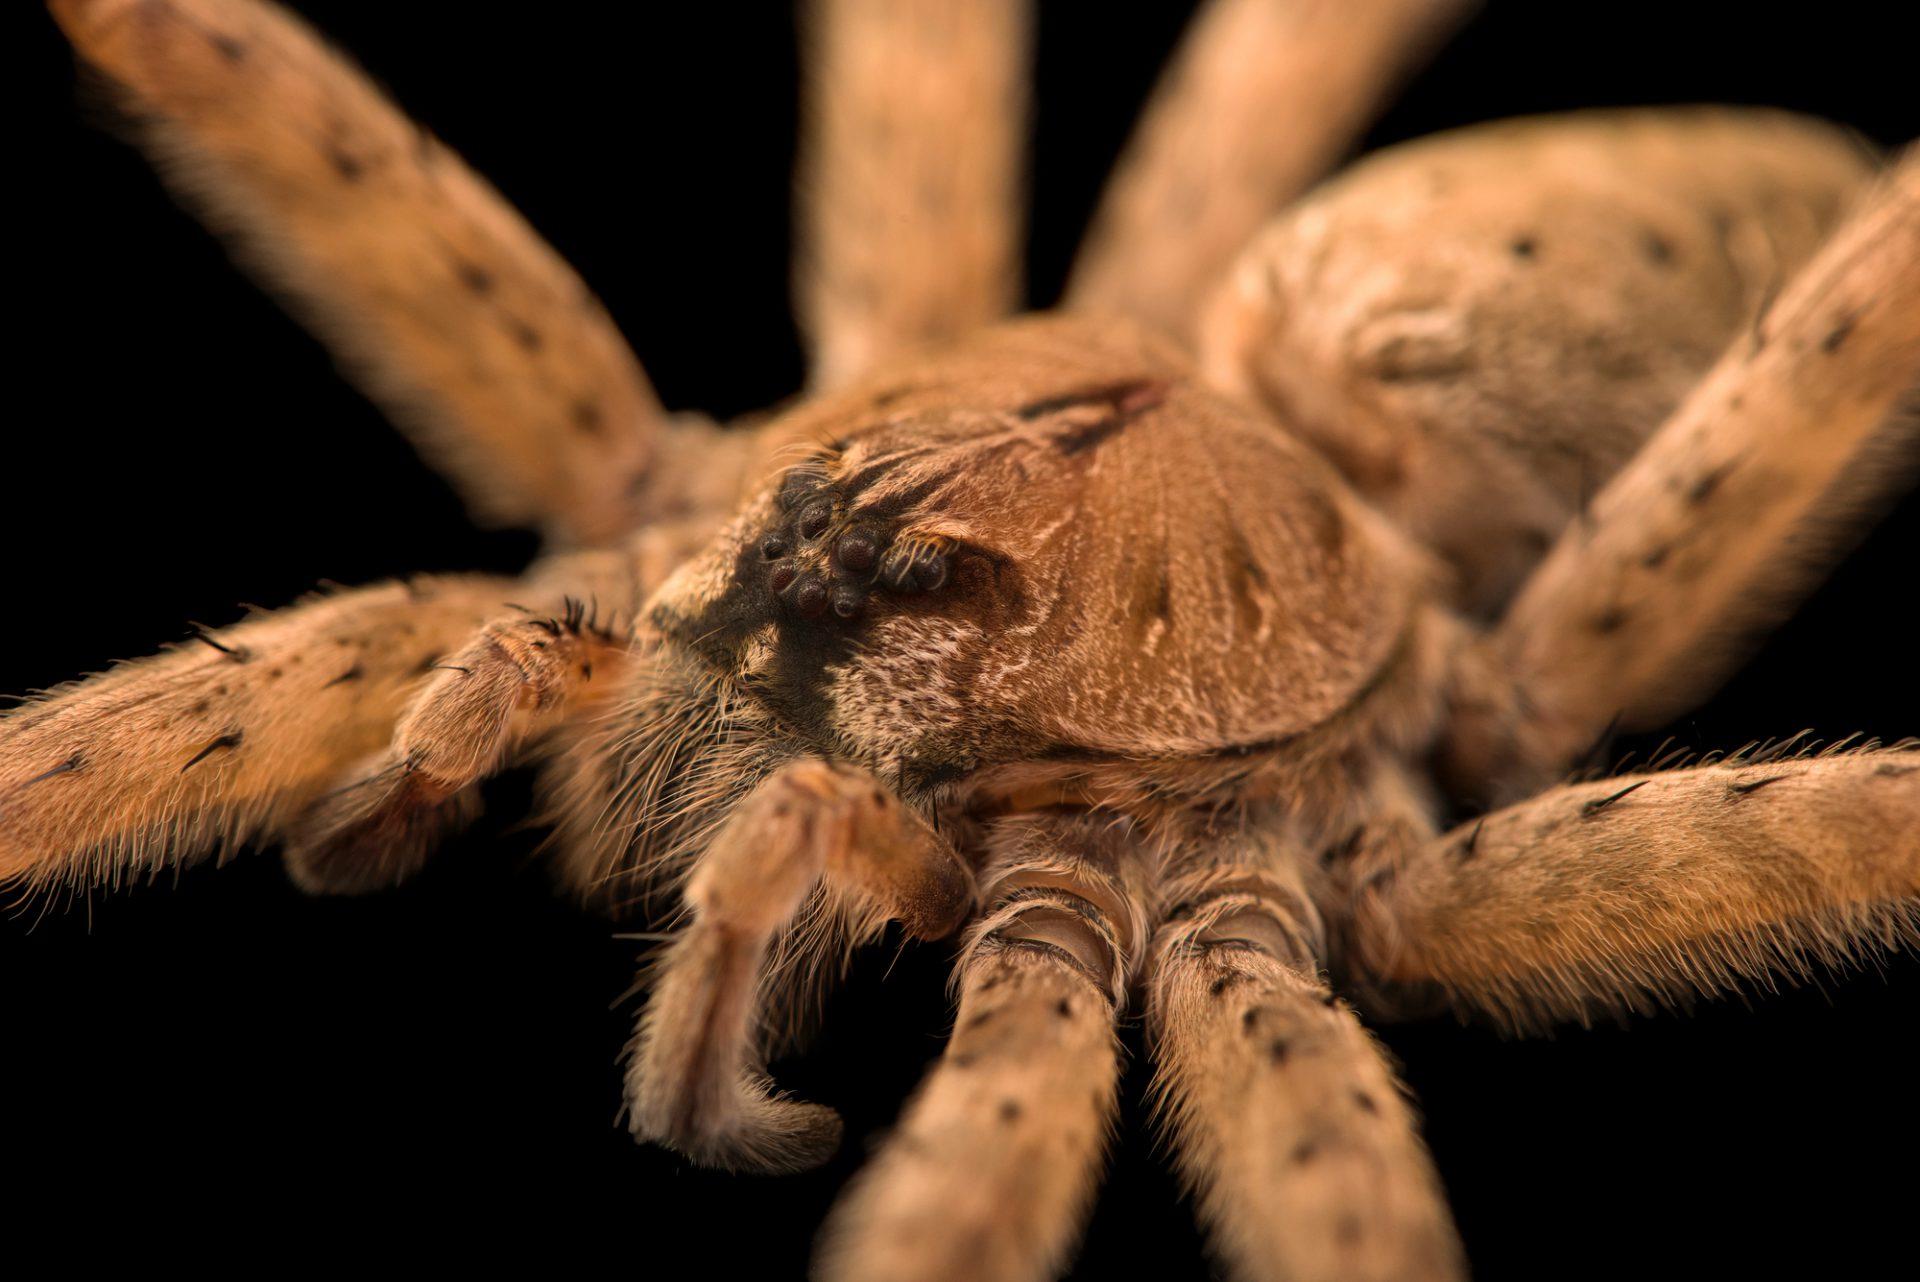 Photo: Fishing spider (Dolomedes tenebrosus) at the Audubon Insectarium.